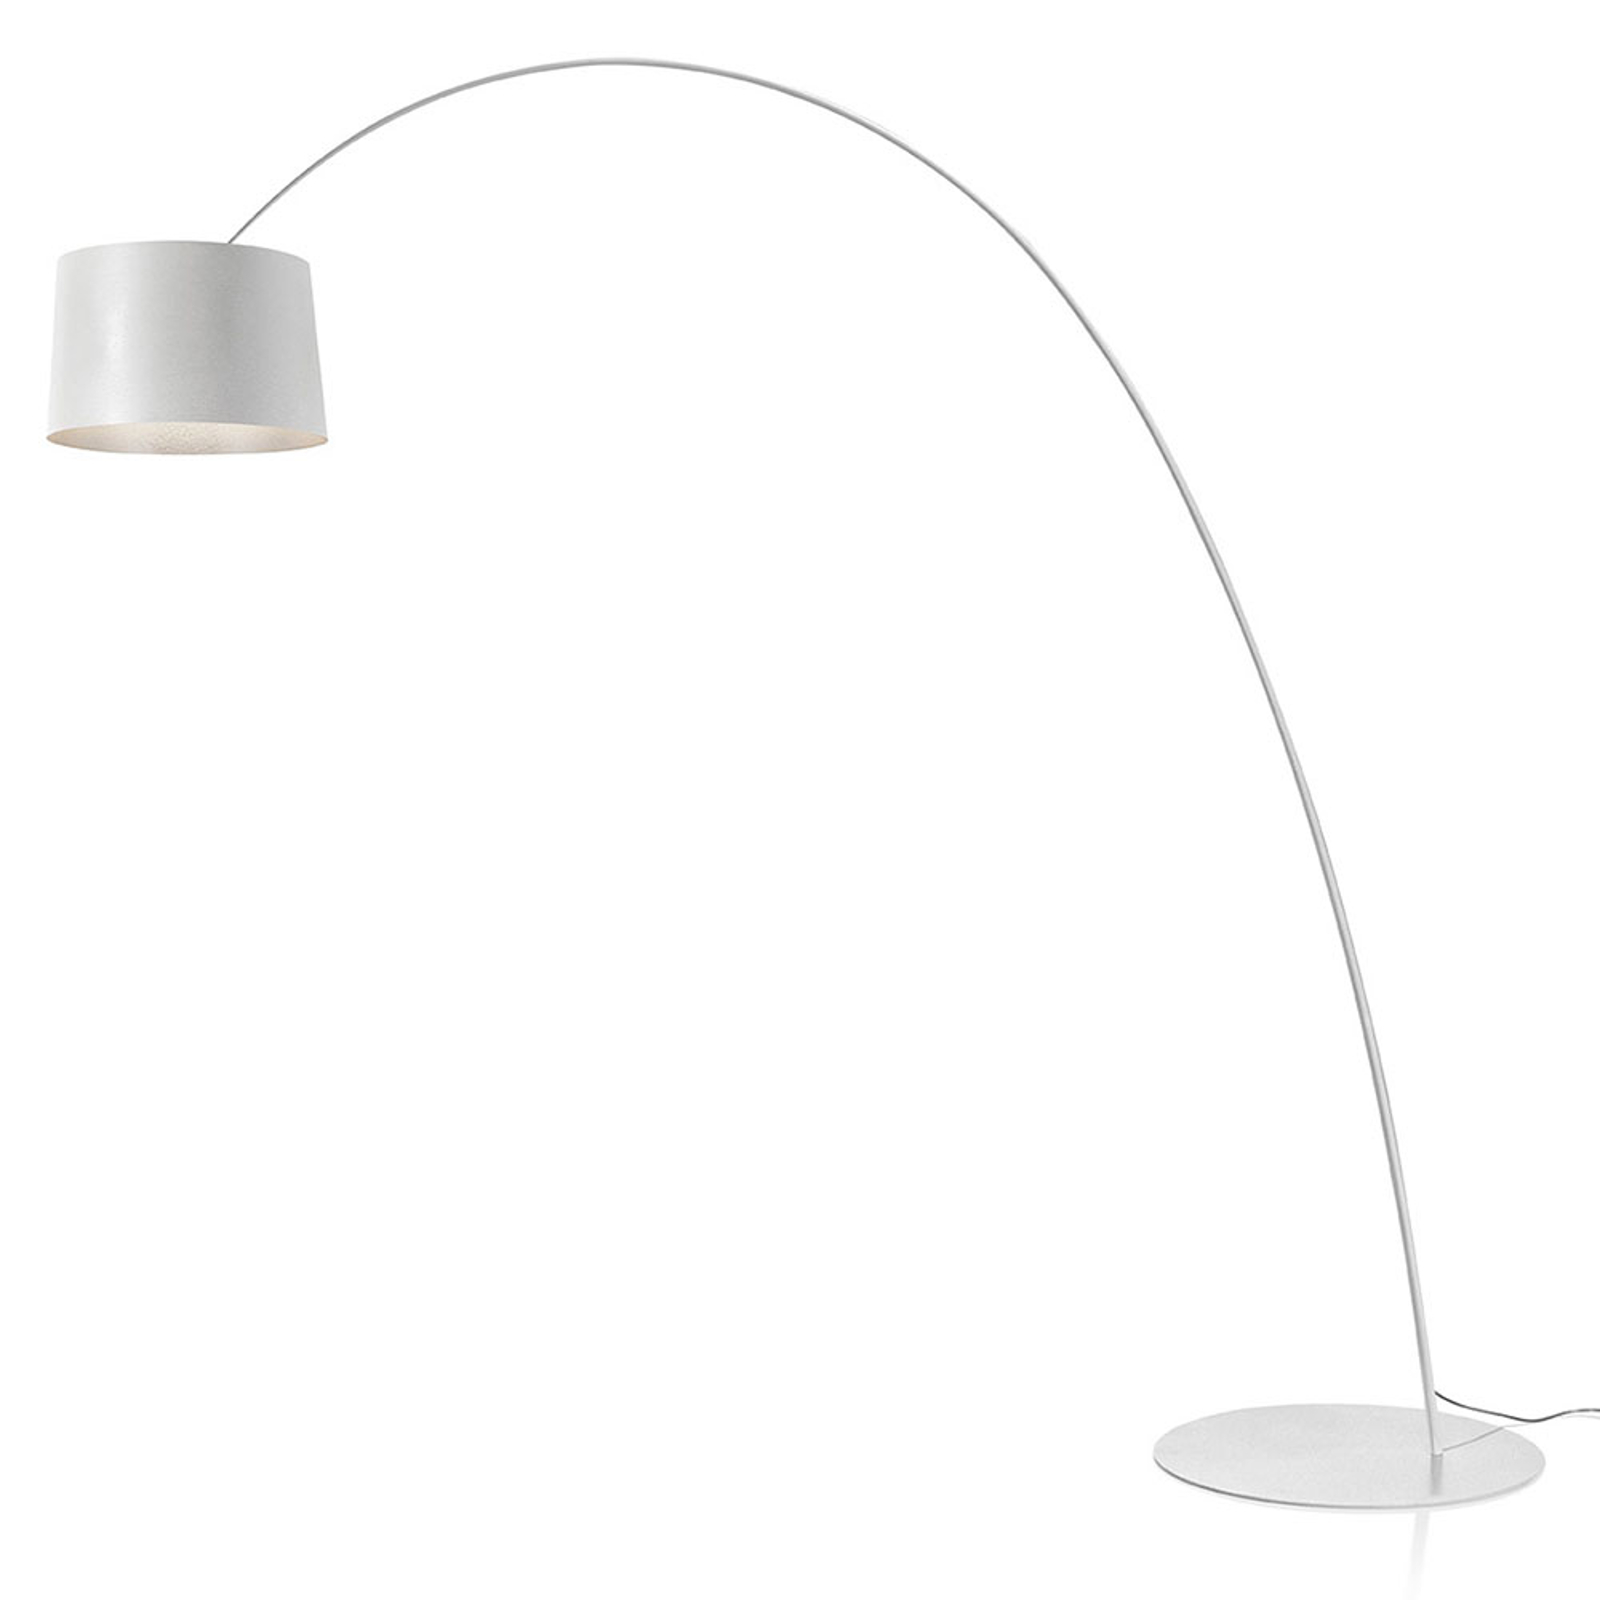 Foscarini Twiggy MyLight lampadaire LED blanc